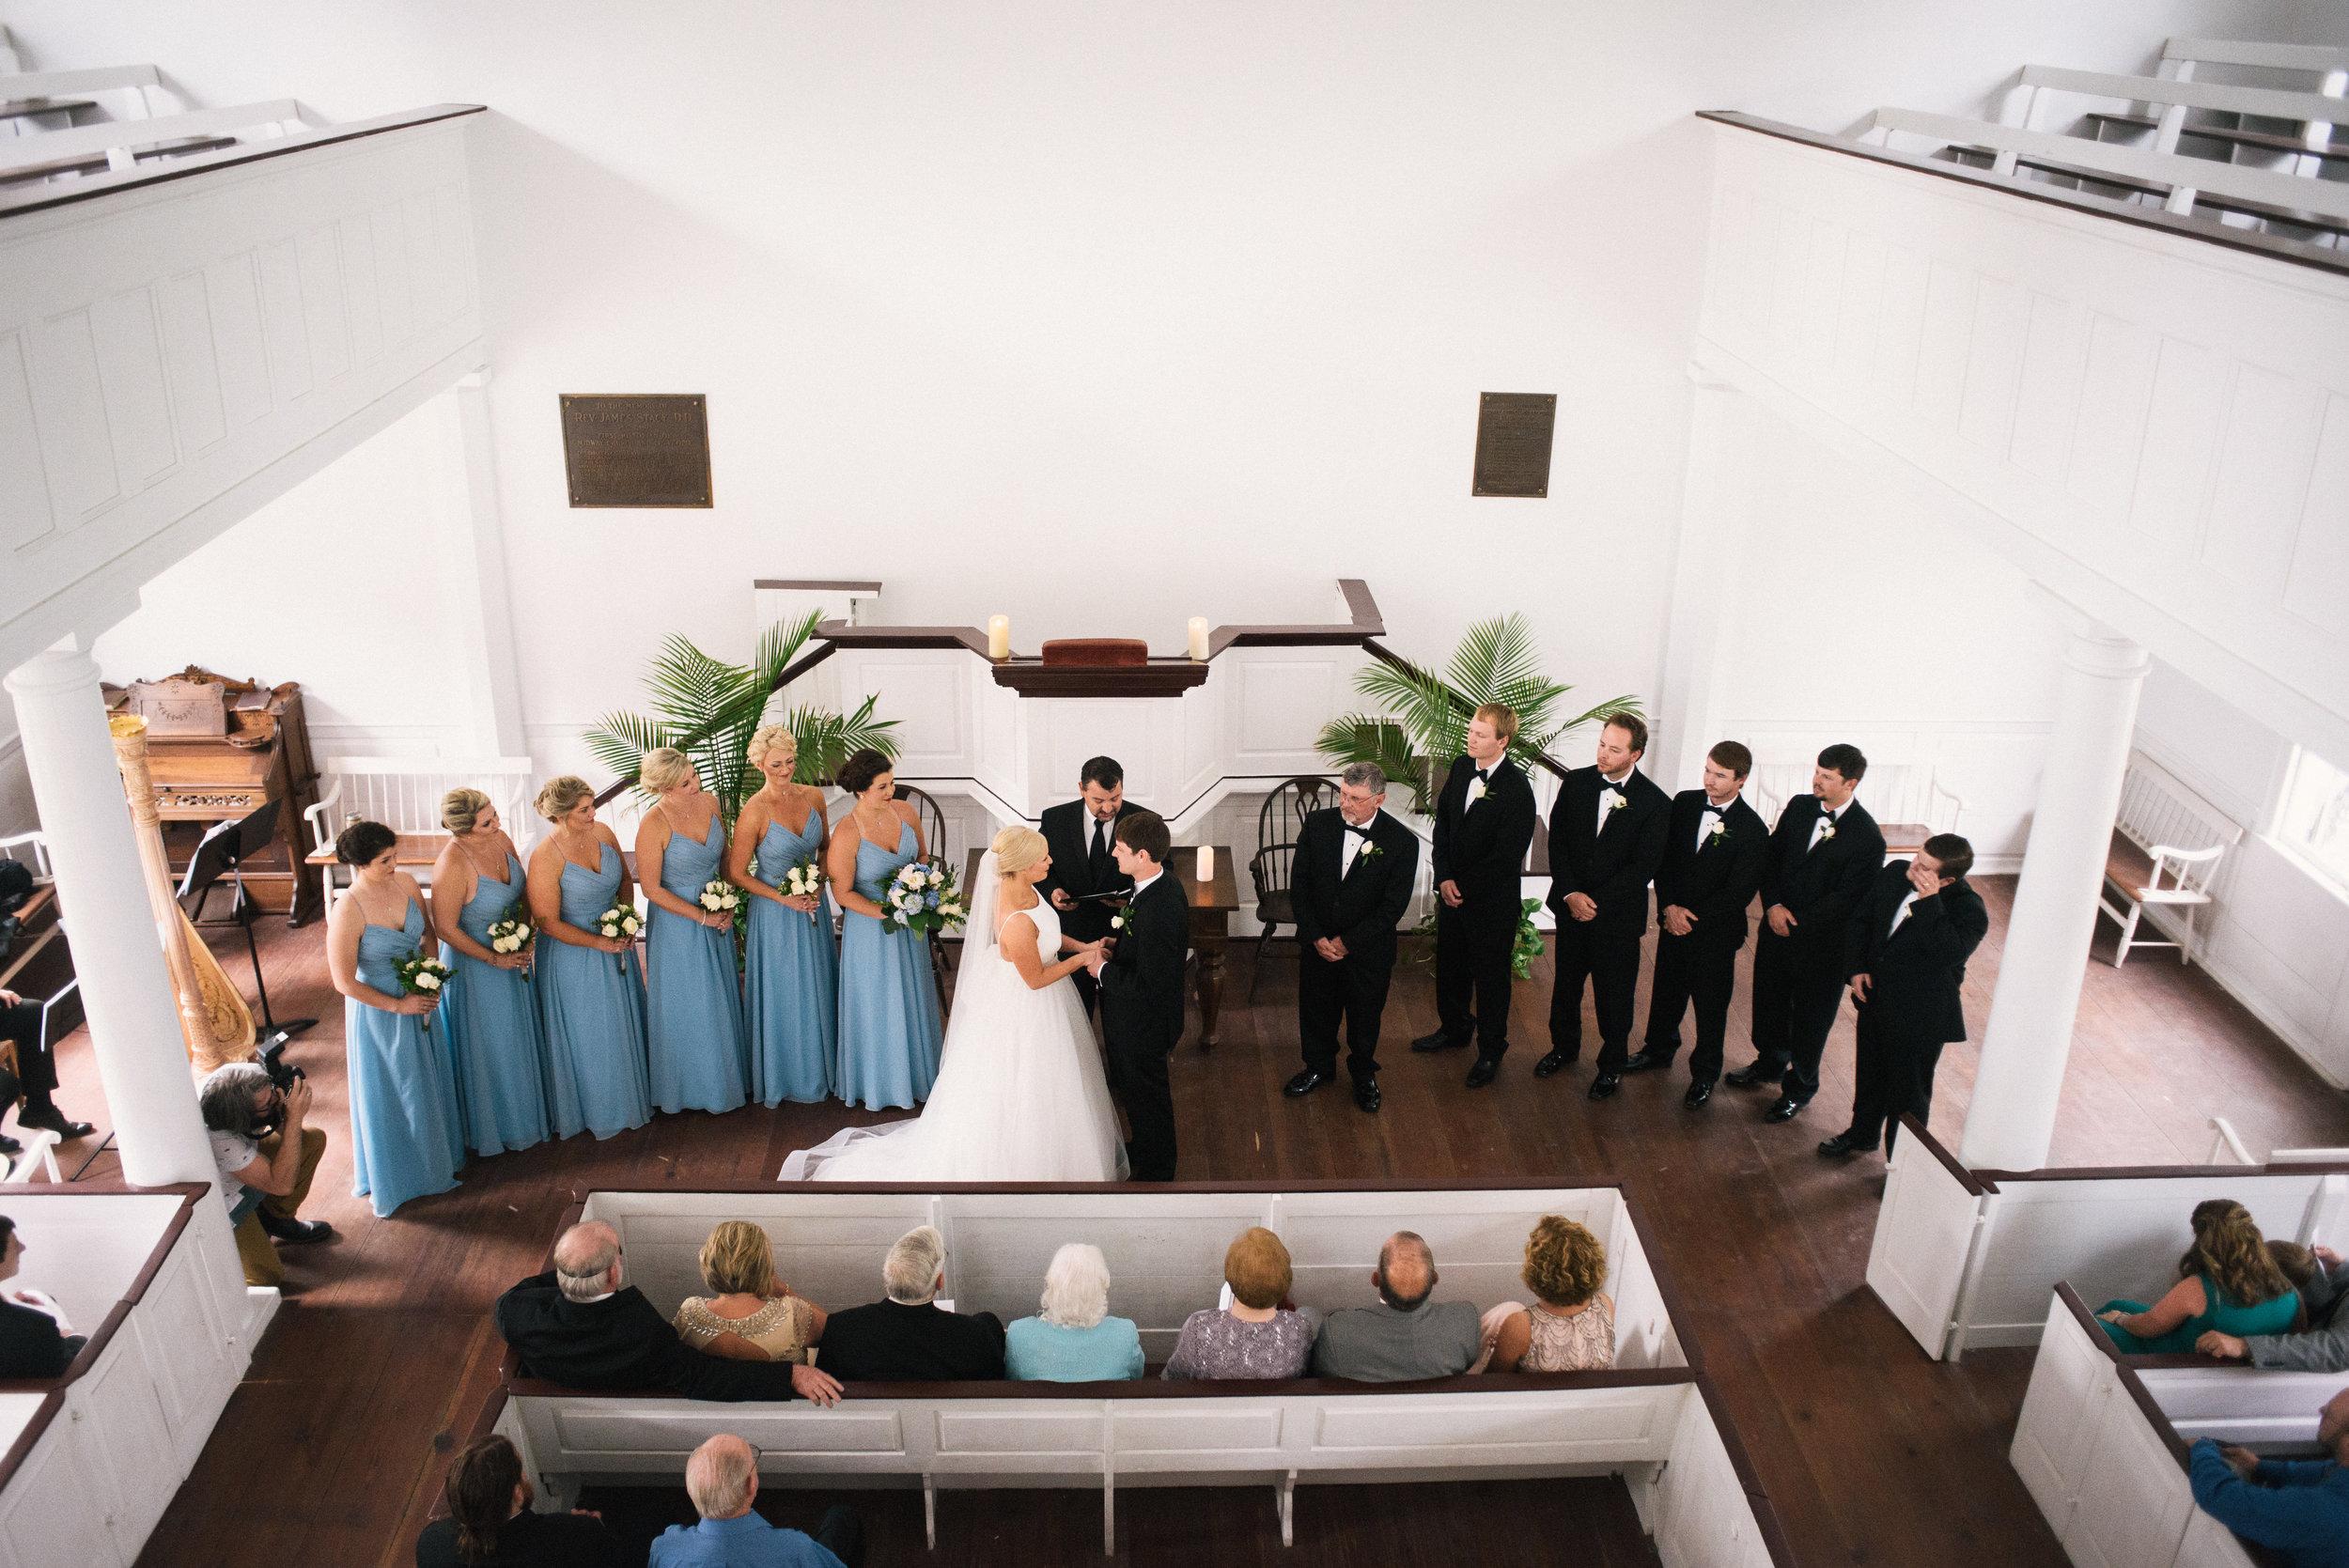 ali-and-jared-savannah-georgia-may-2017-wedding-meg-hill-photo-(293of760).jpg